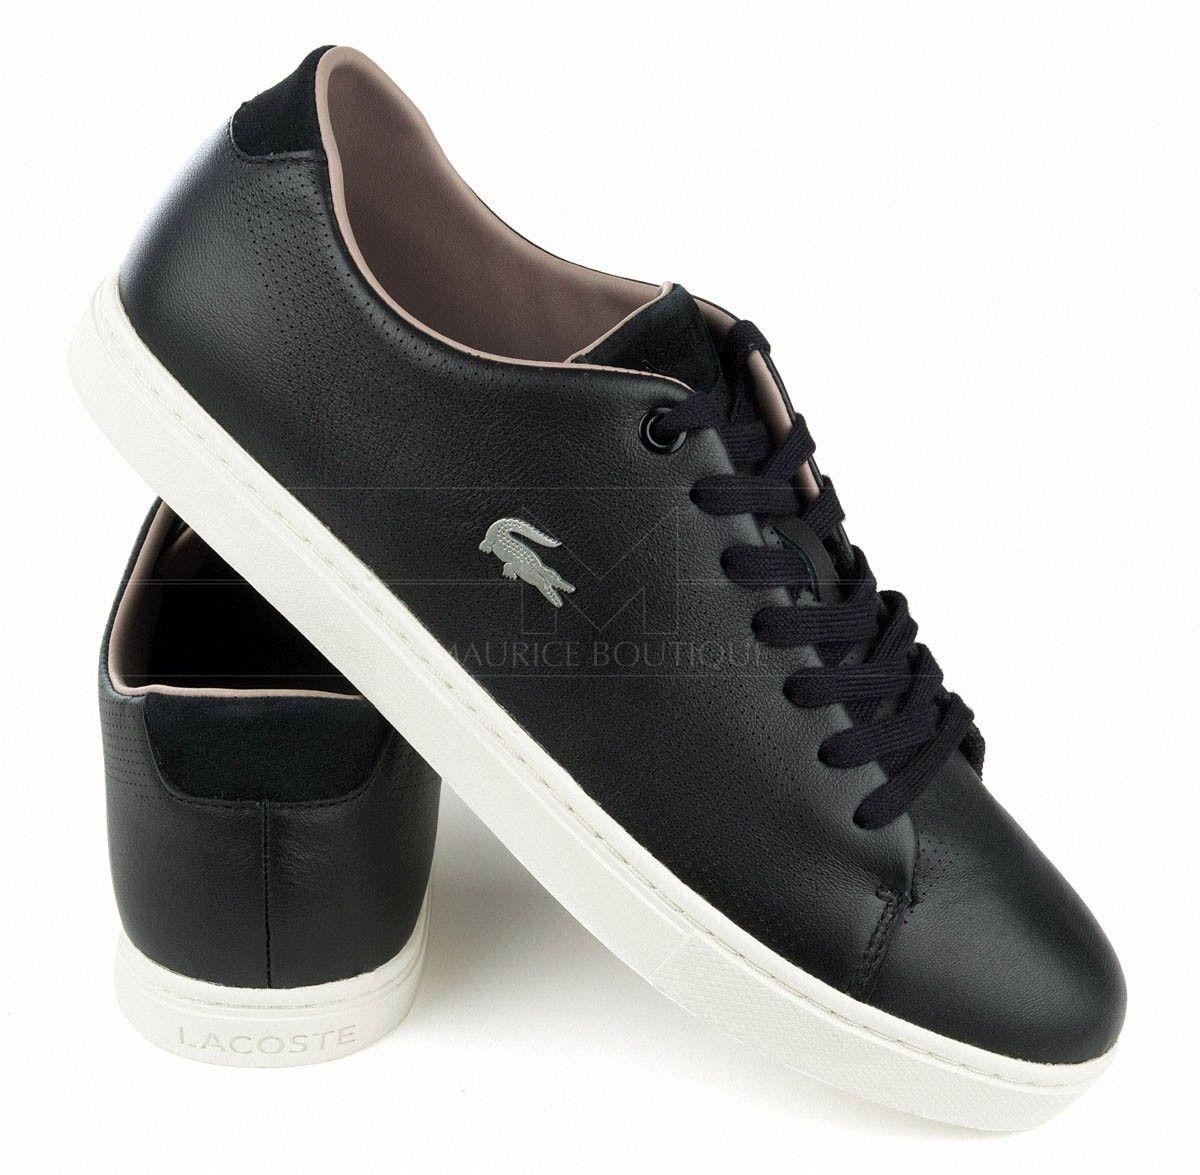 Lacoste Shoes Zapatillas Lacoste Negras Showcourt Zapatillas Lacoste Zapatos Lacoste Zapatos Hombre